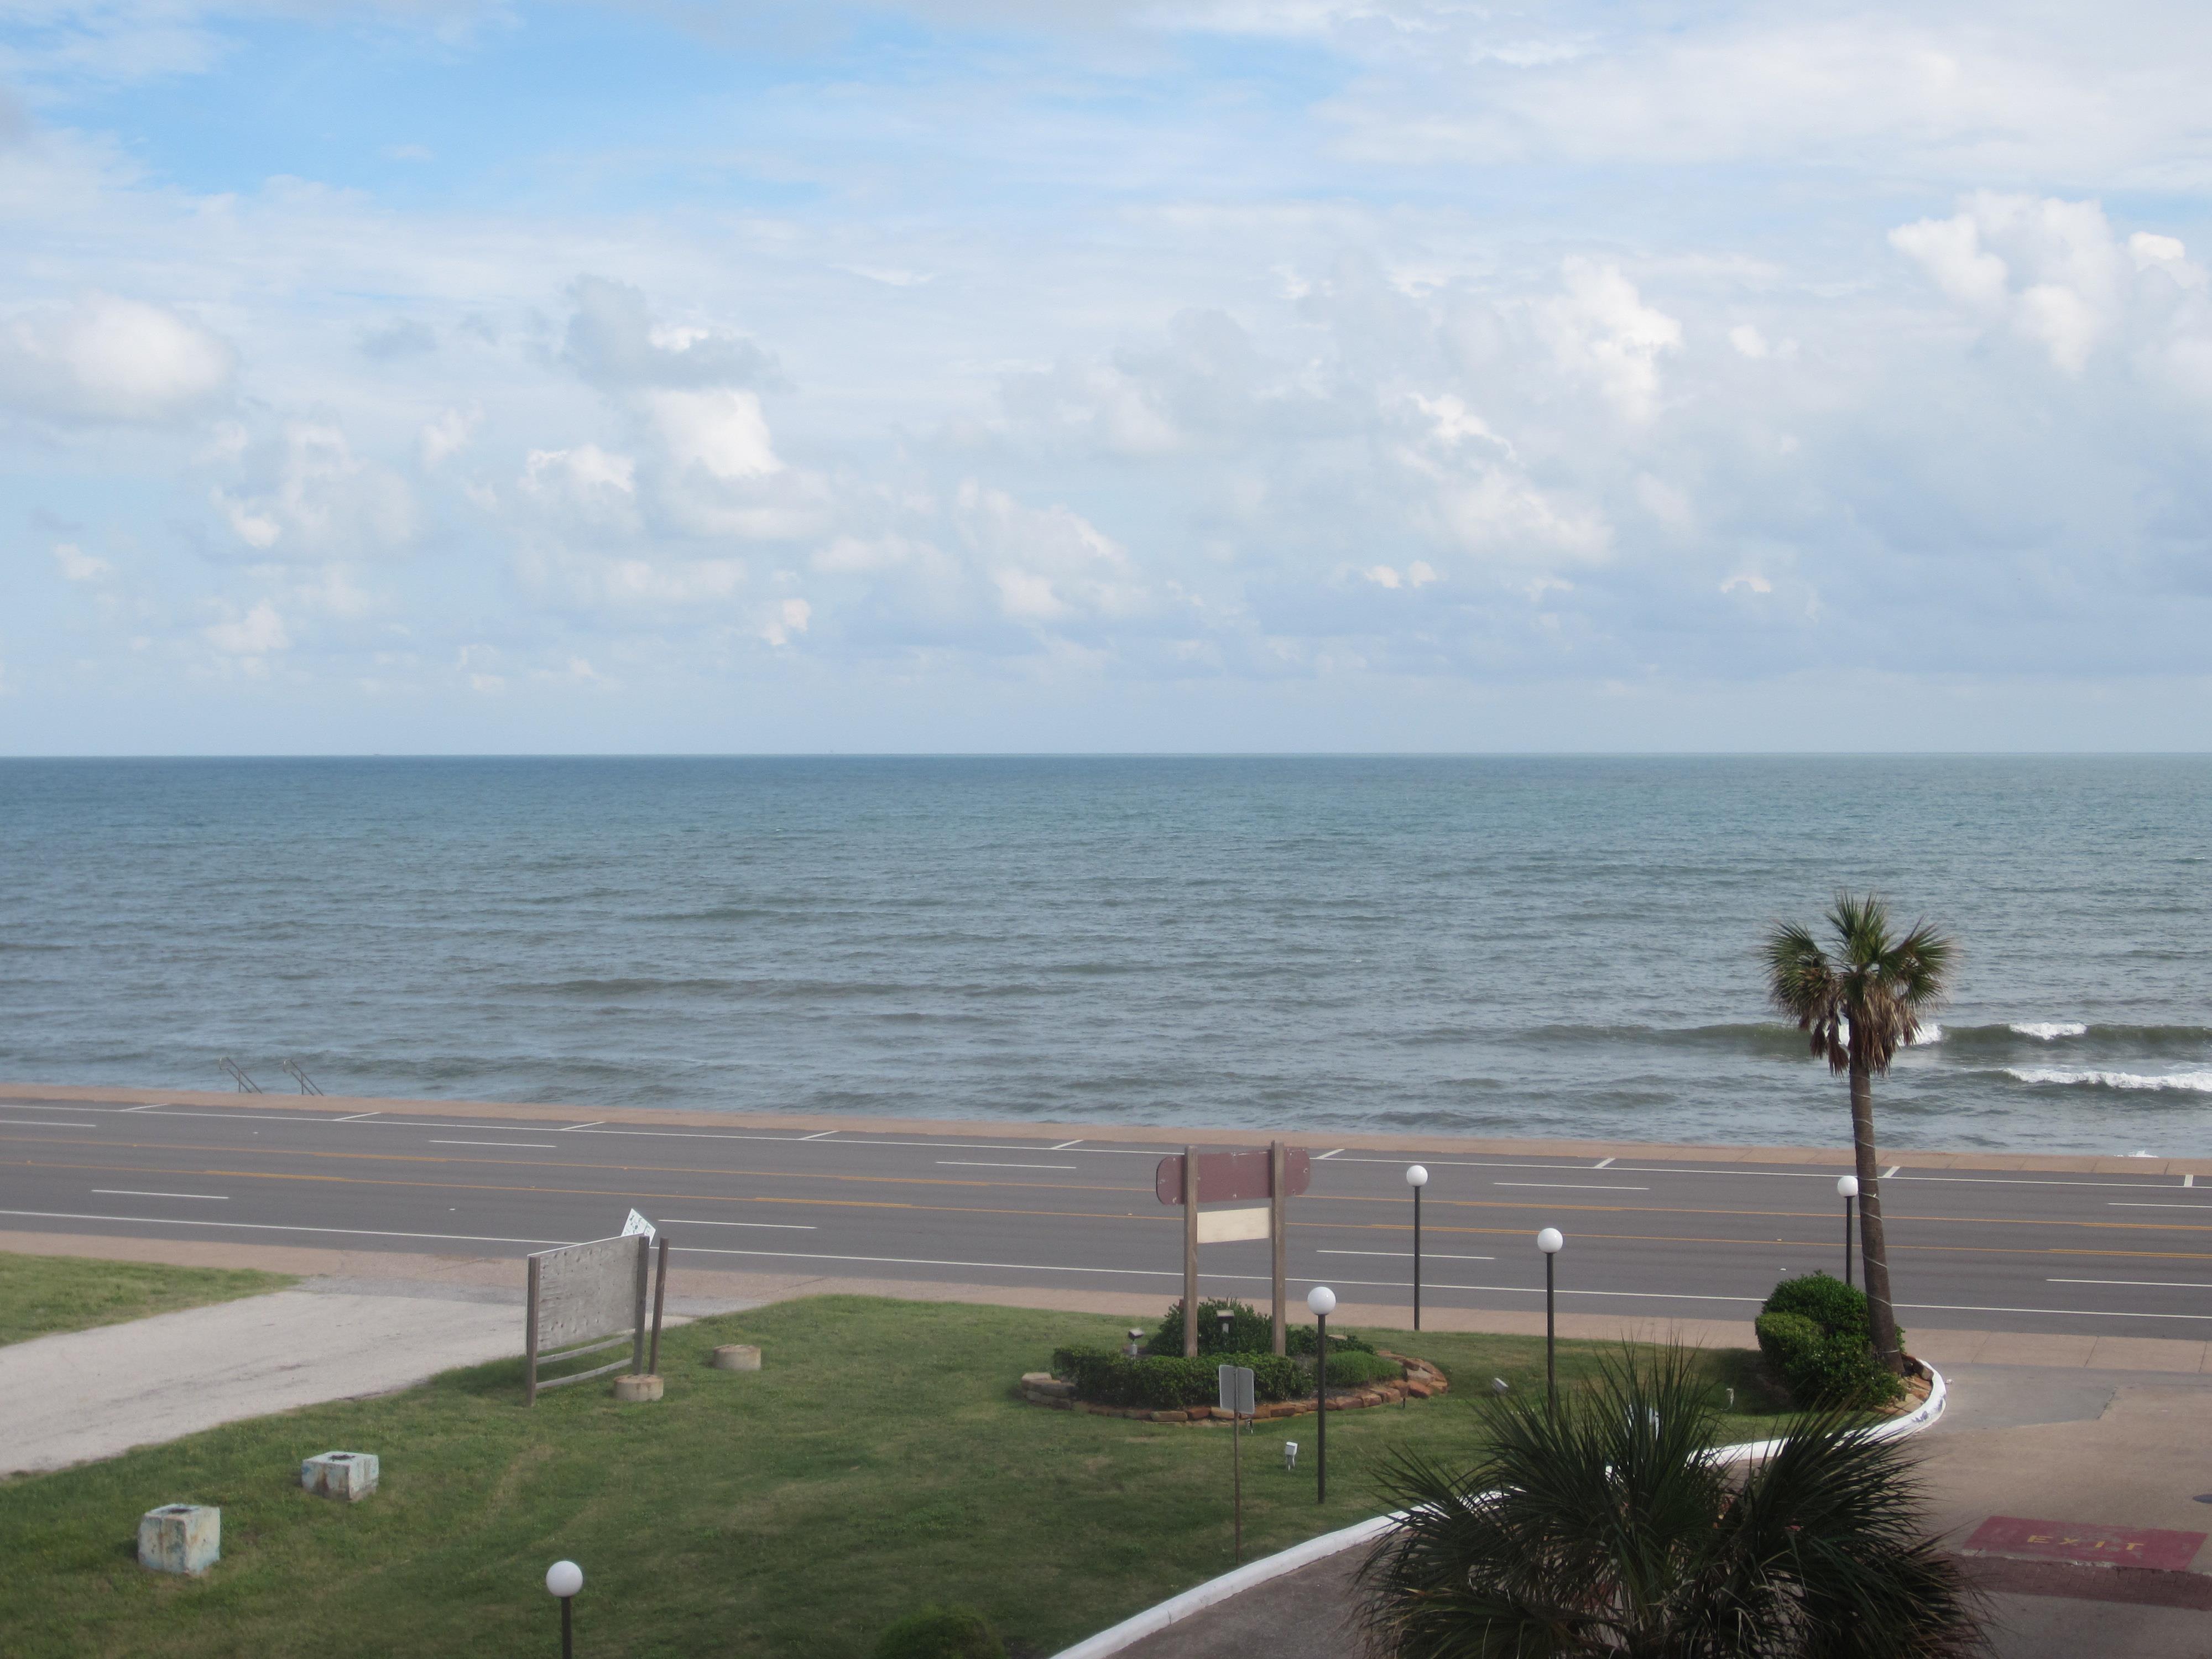 Vacation rentals in Galveston